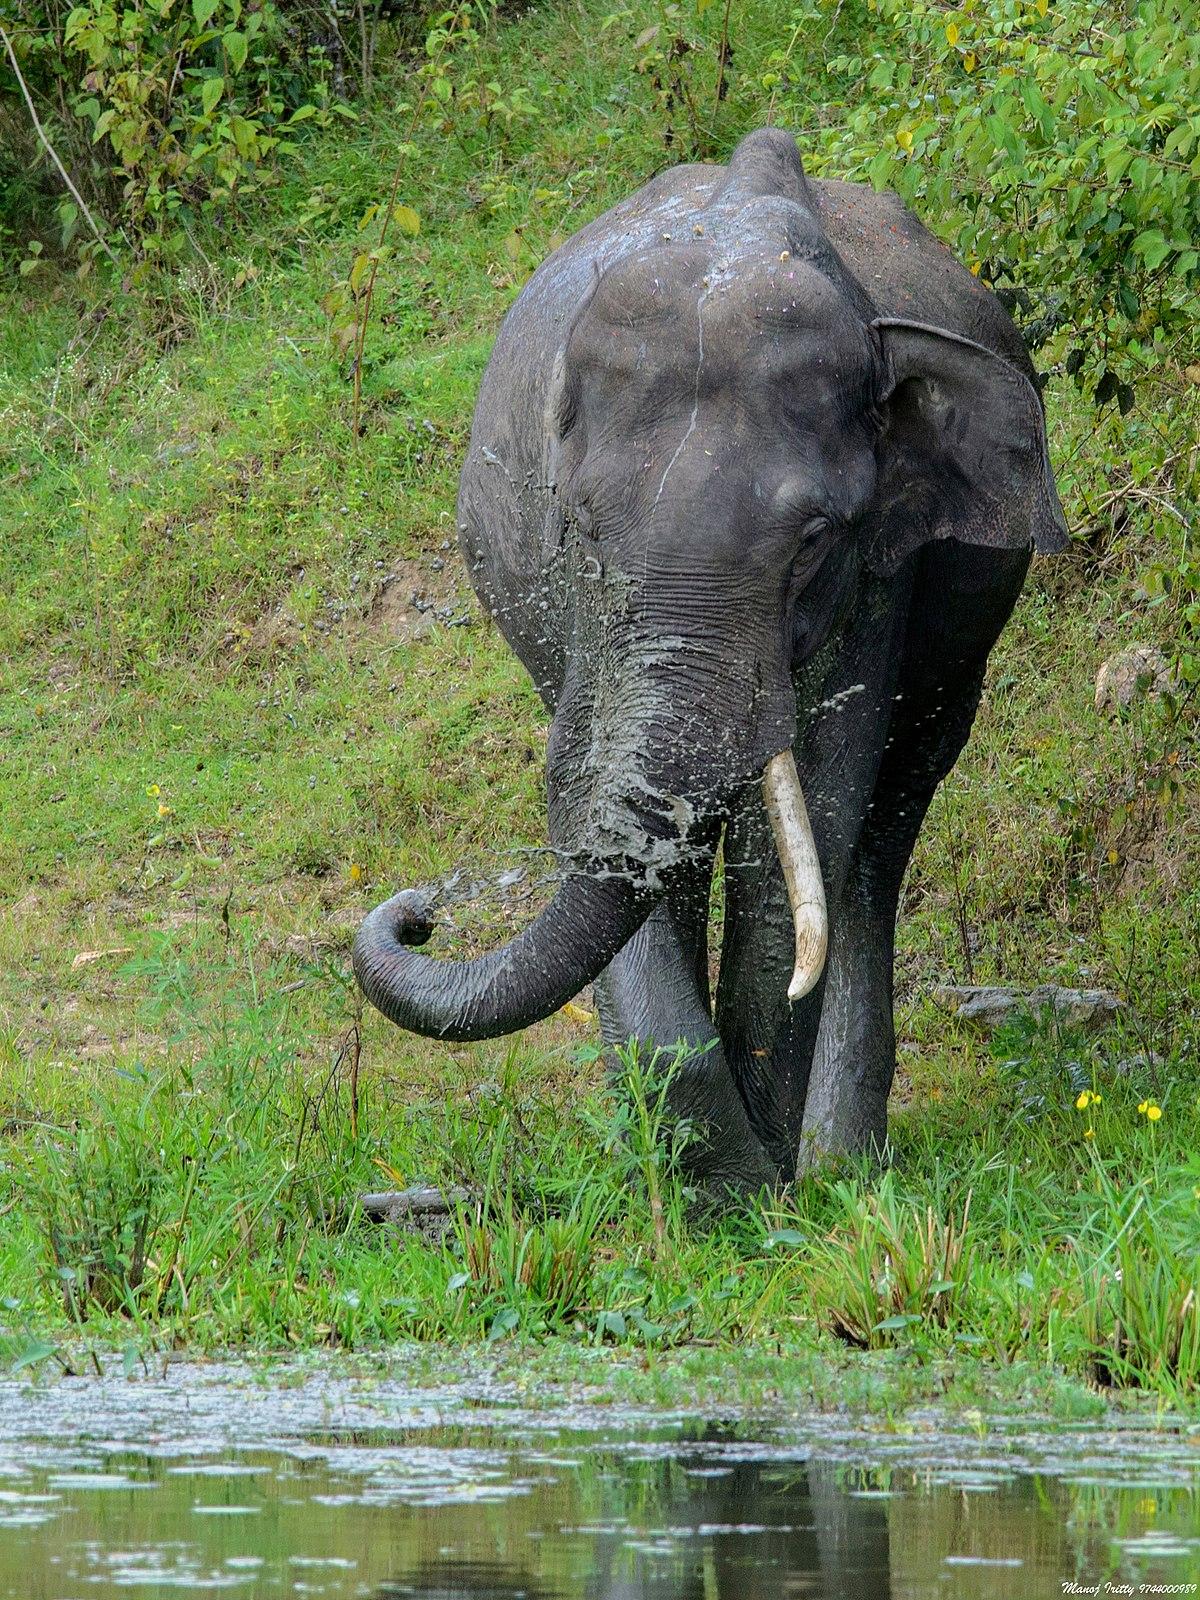 borneo elephant wikipedia